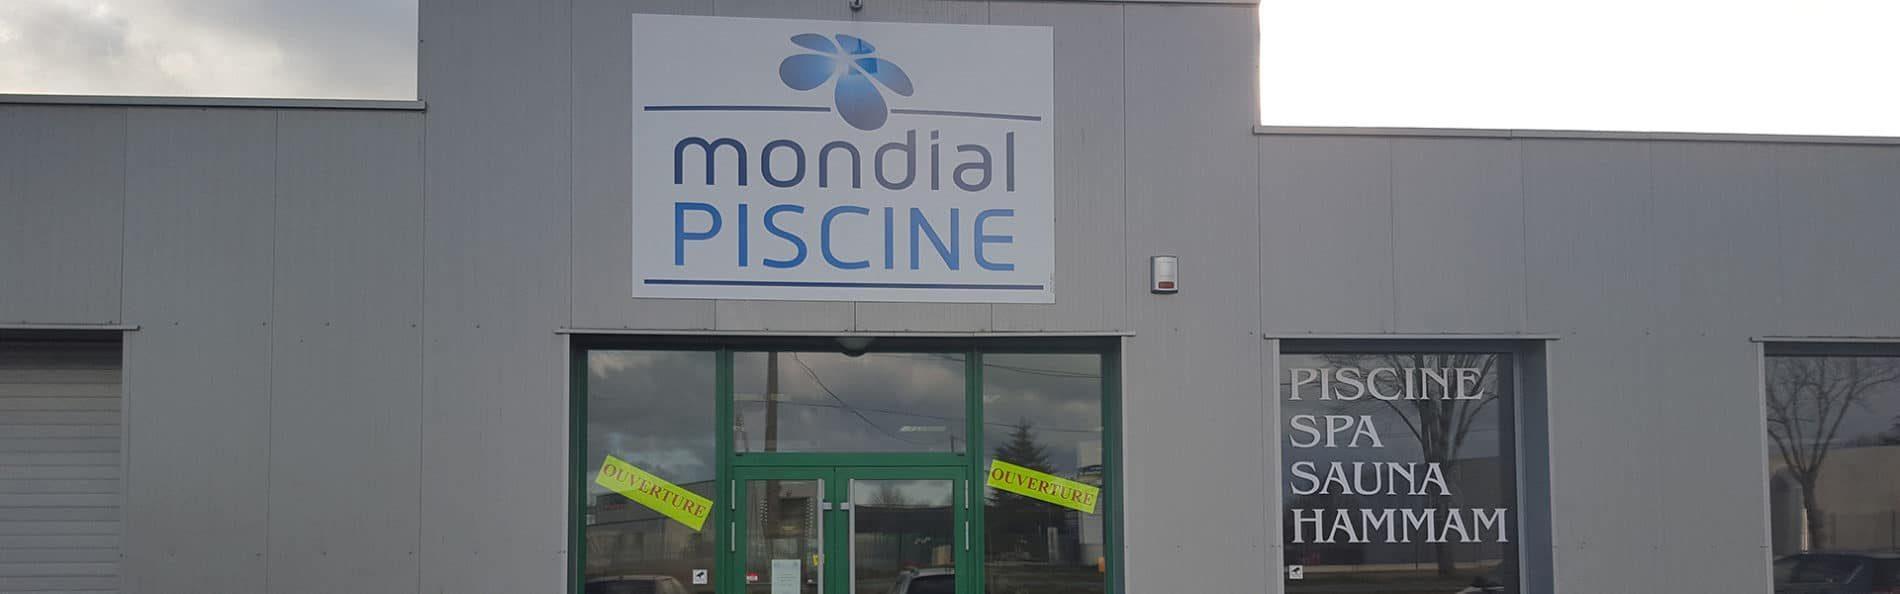 Ilot Piscines Nantes – Mondial Piscine